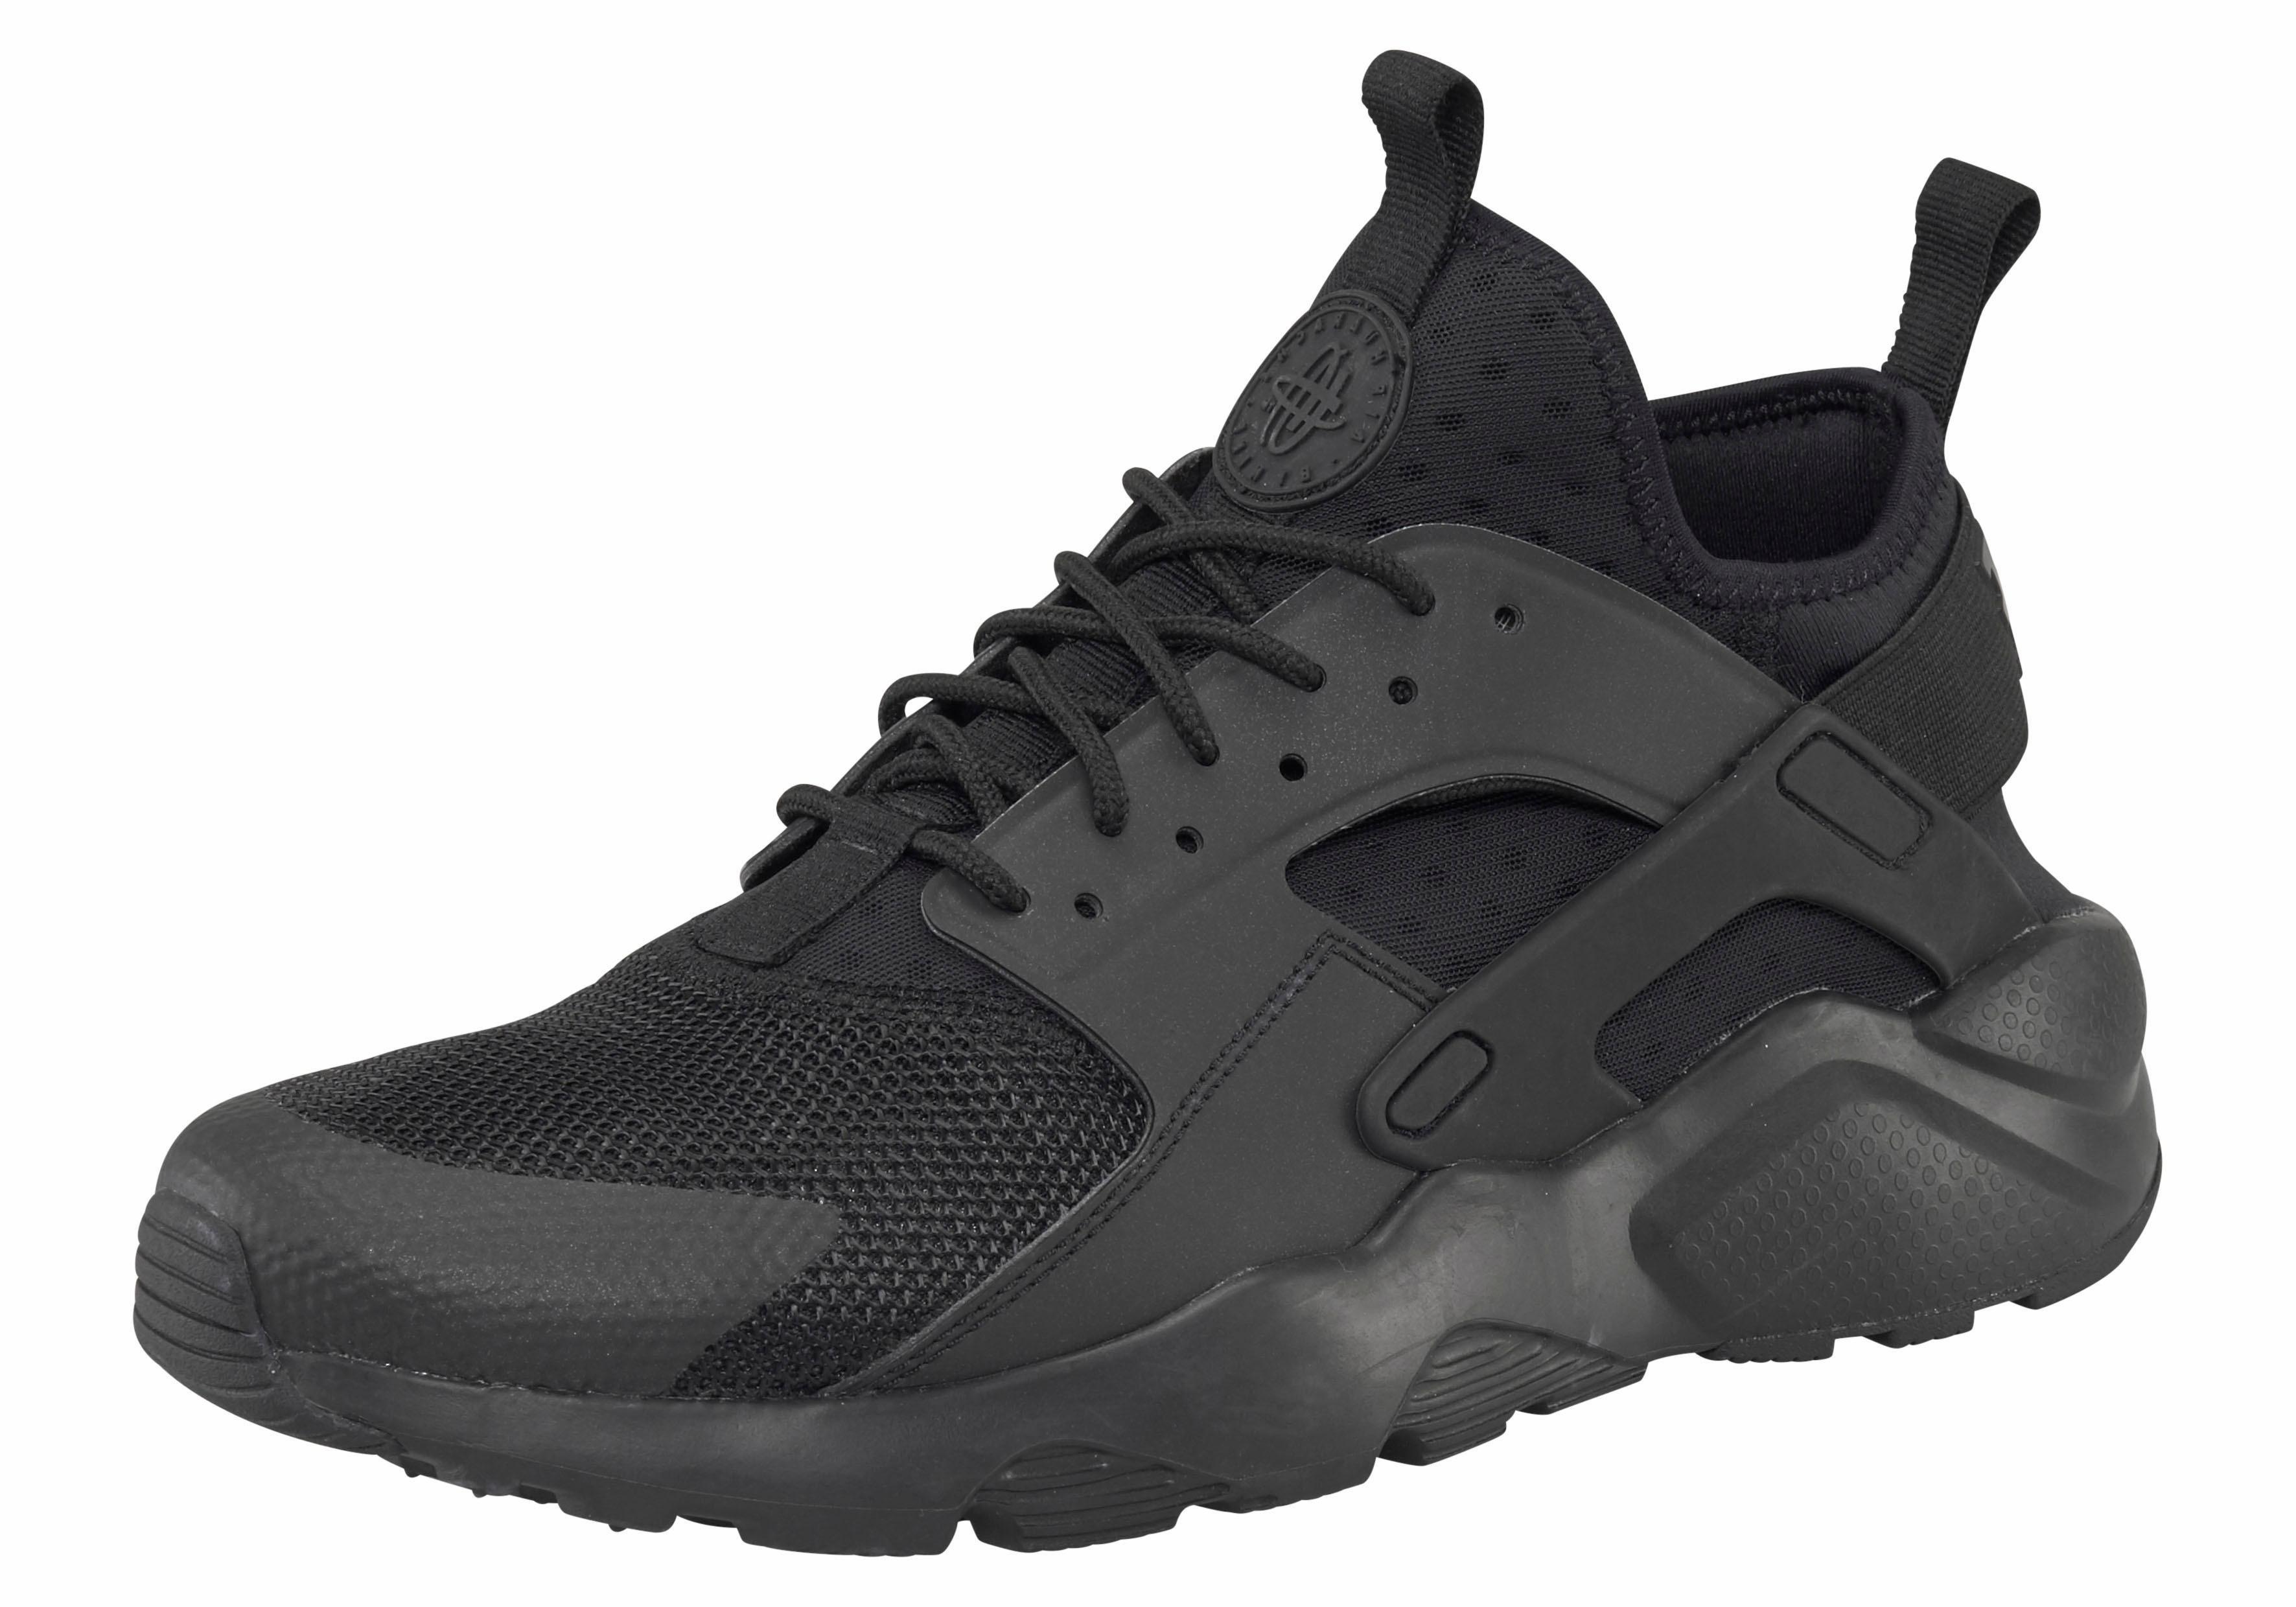 huge selection of 5a458 471c3 Afbeeldingsbron Nike Sportswear sneakers »Air Huarache Run Ultra«